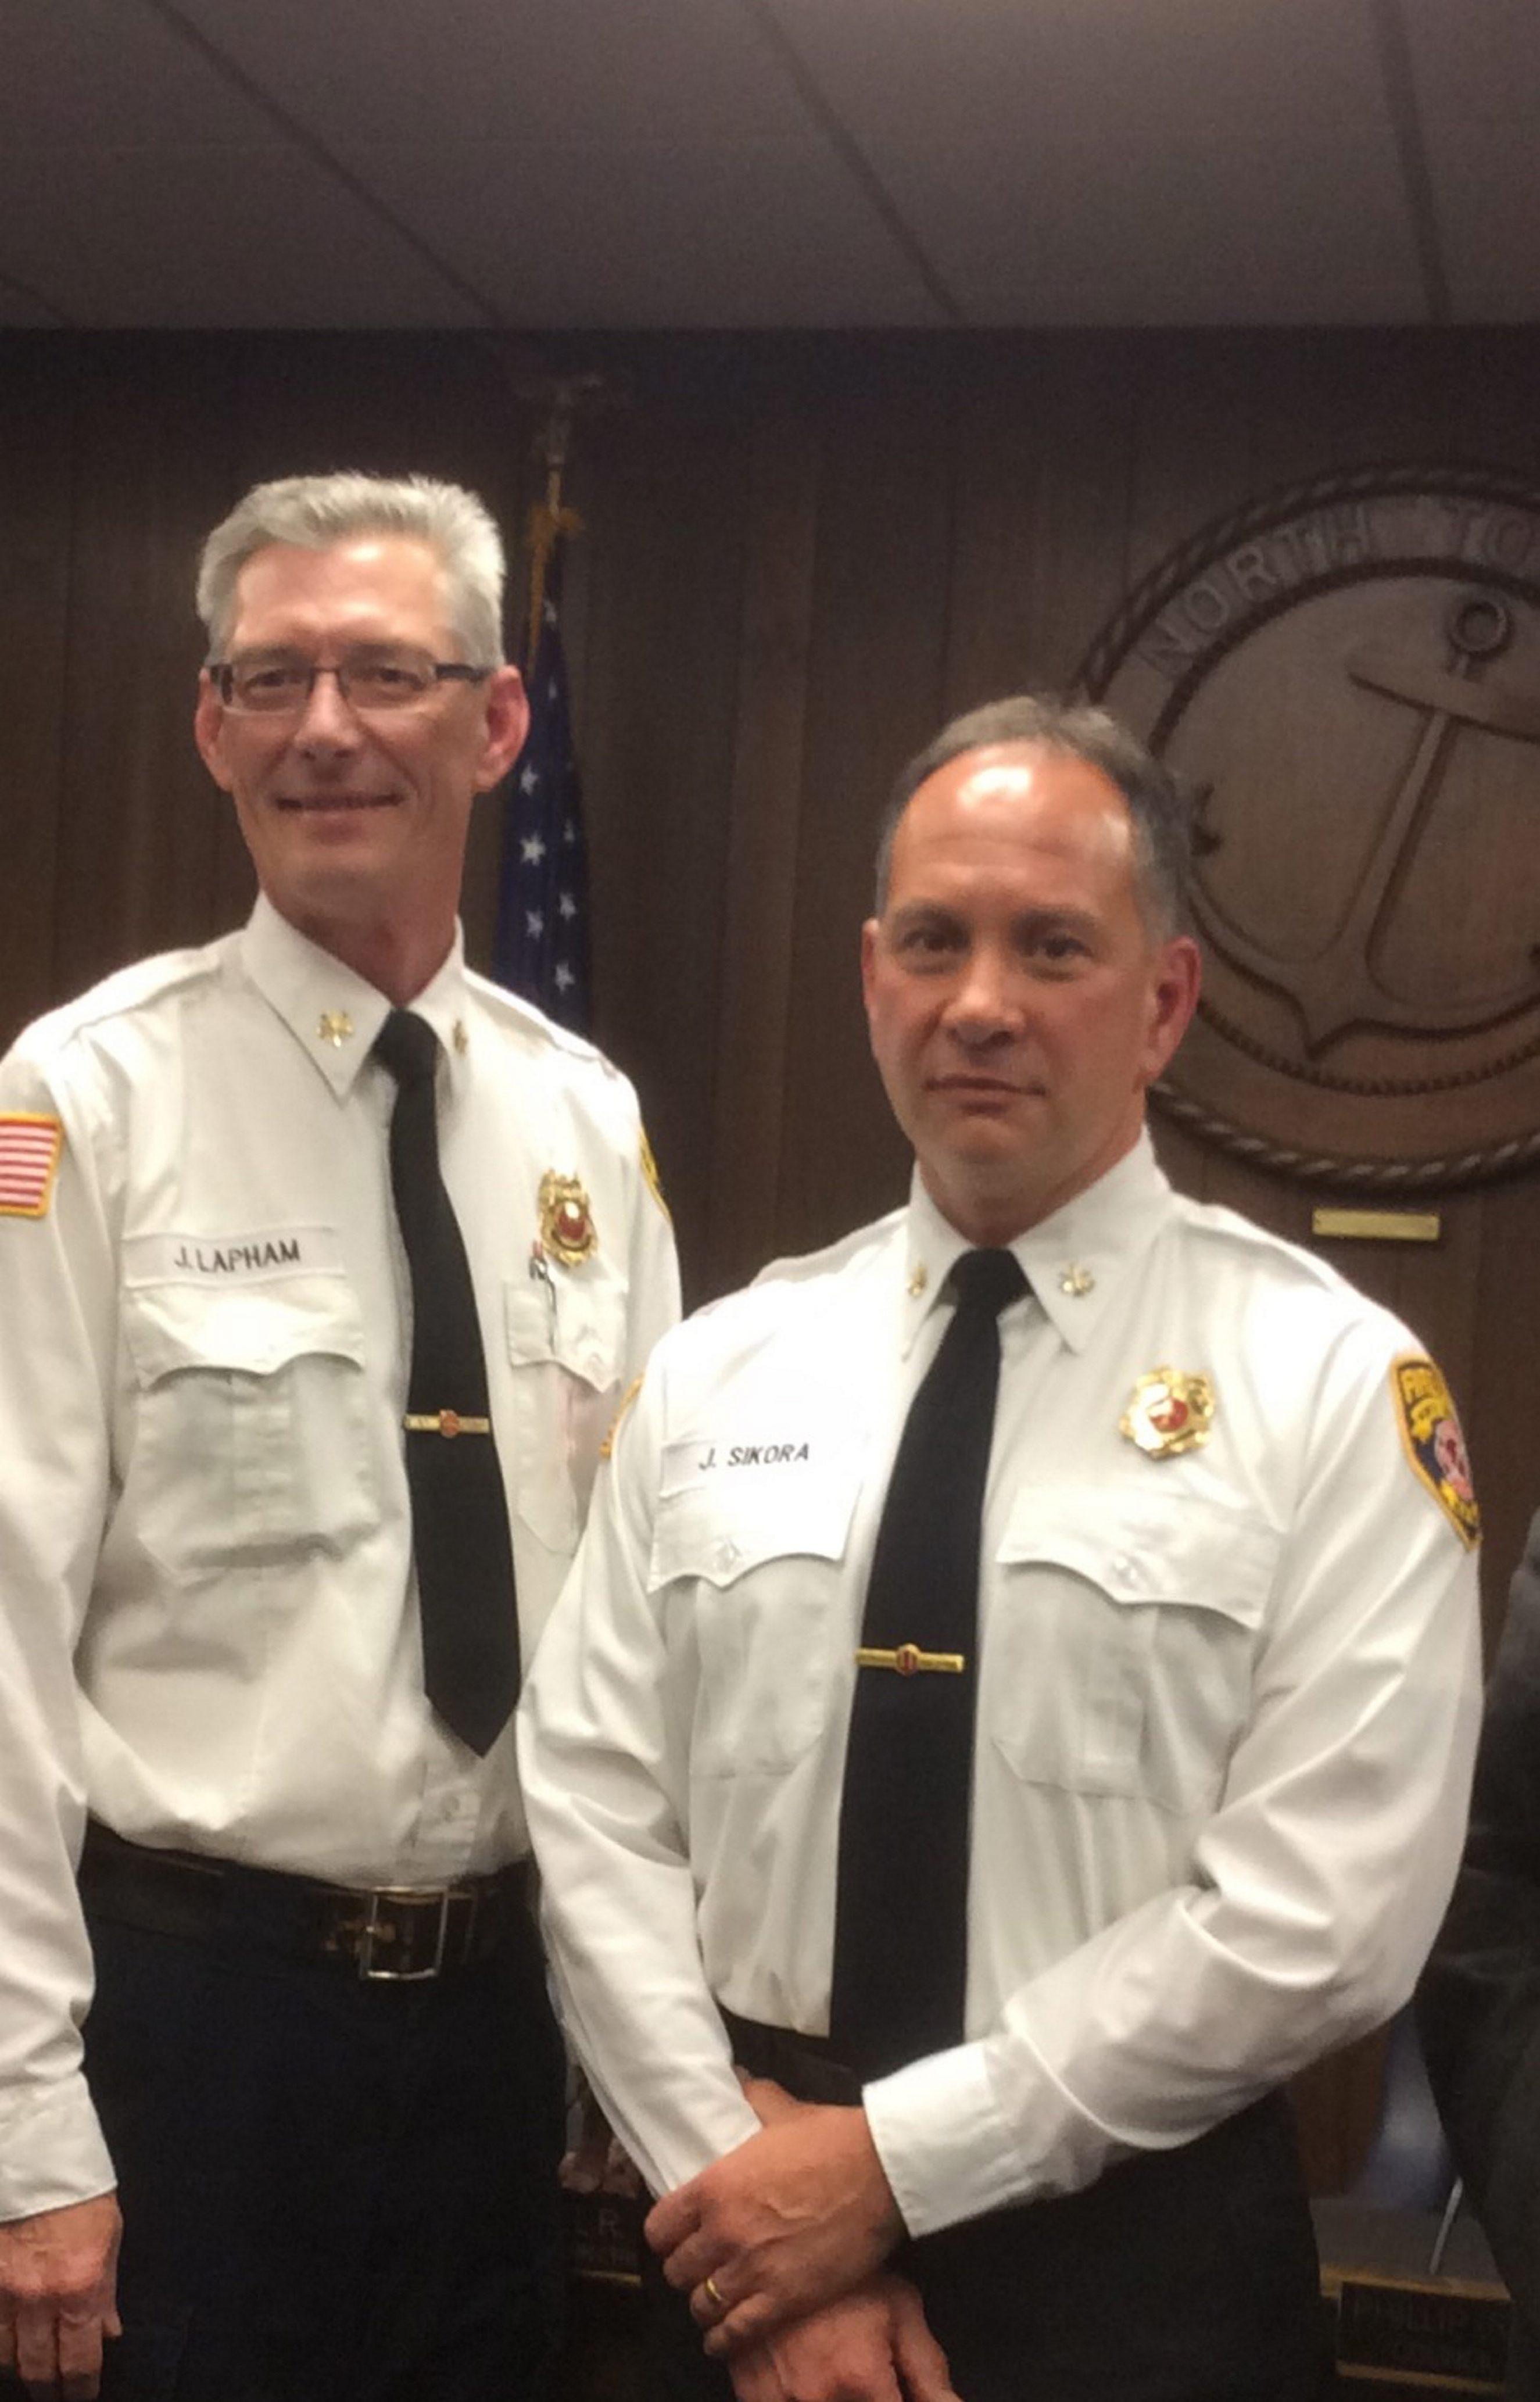 Joseph Sikora, right, was named North Tonawanda Fire Chief, taking over for Chief John C. Lapham who will retire on Thursday.